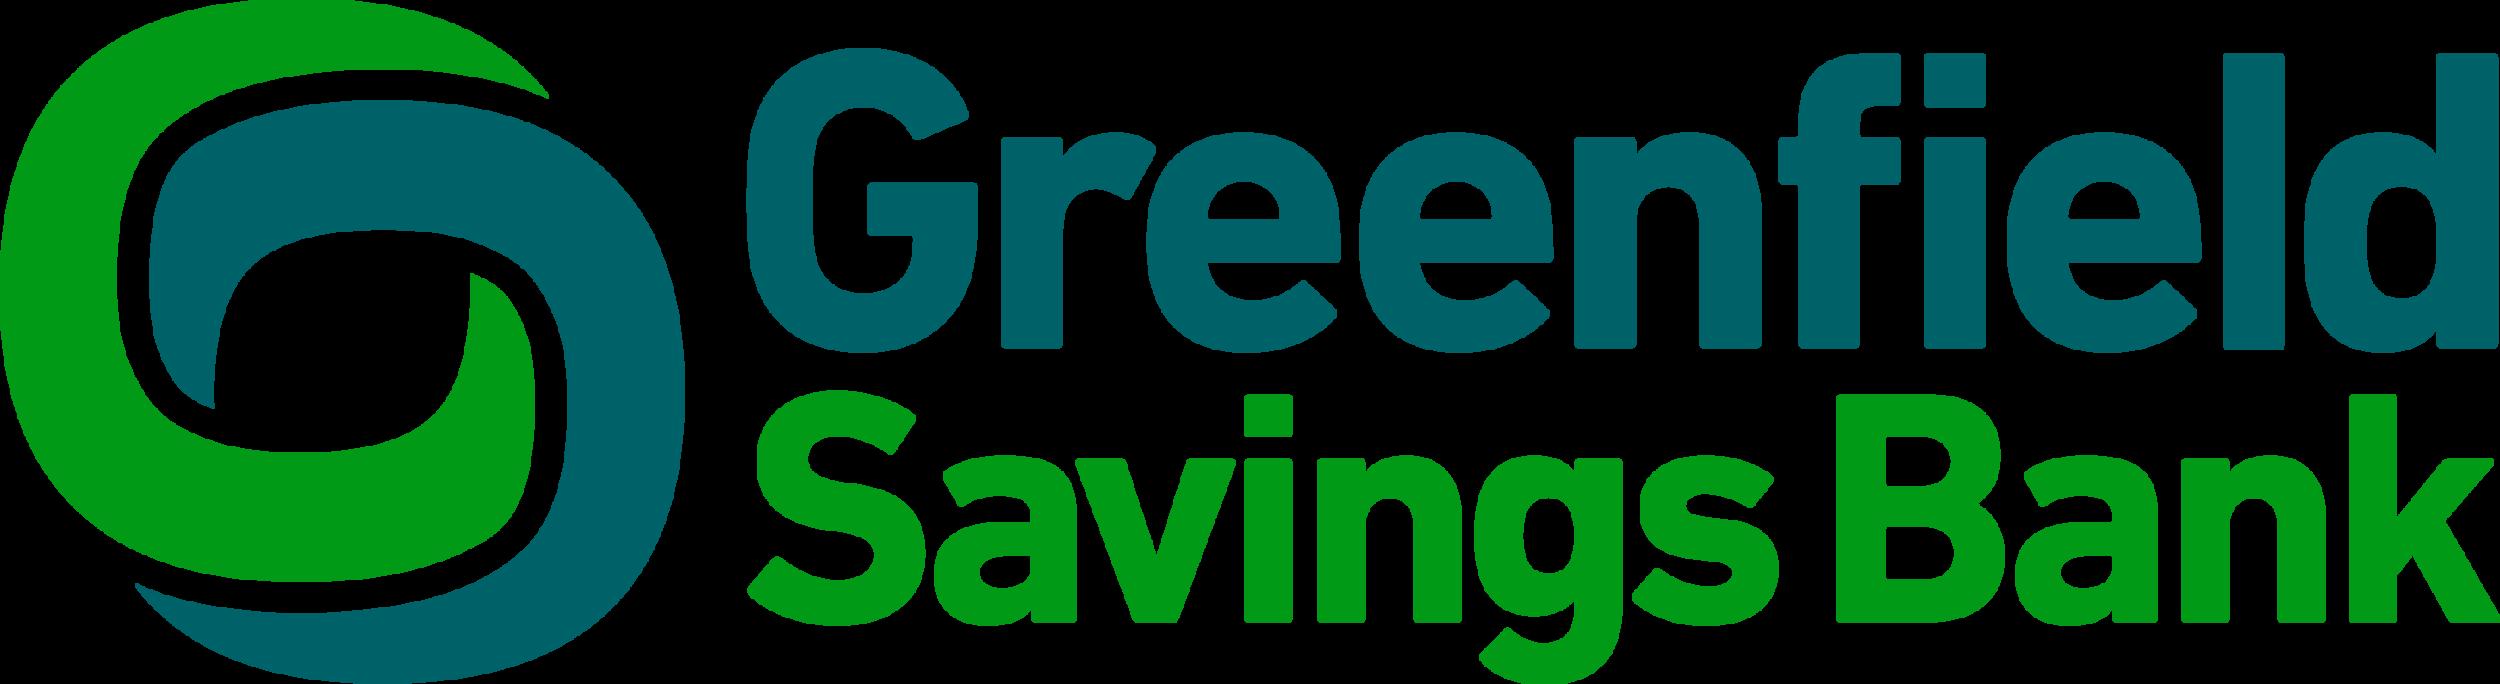 GSB-2017-Logo-Web-RGB (1).png